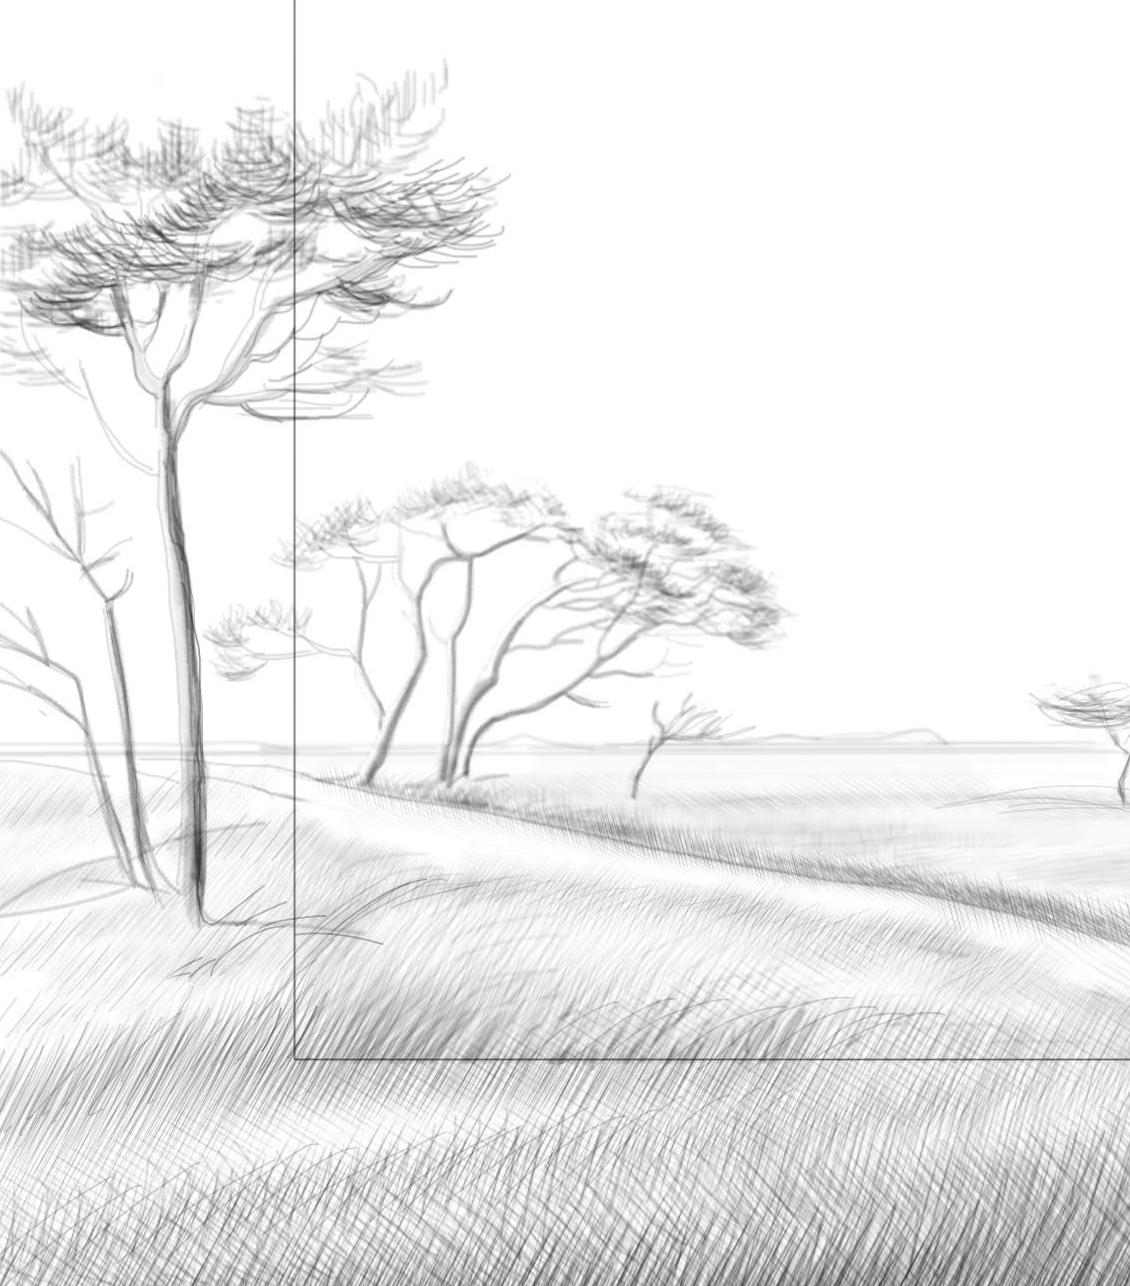 Journey through the Serengeti – MFW 19